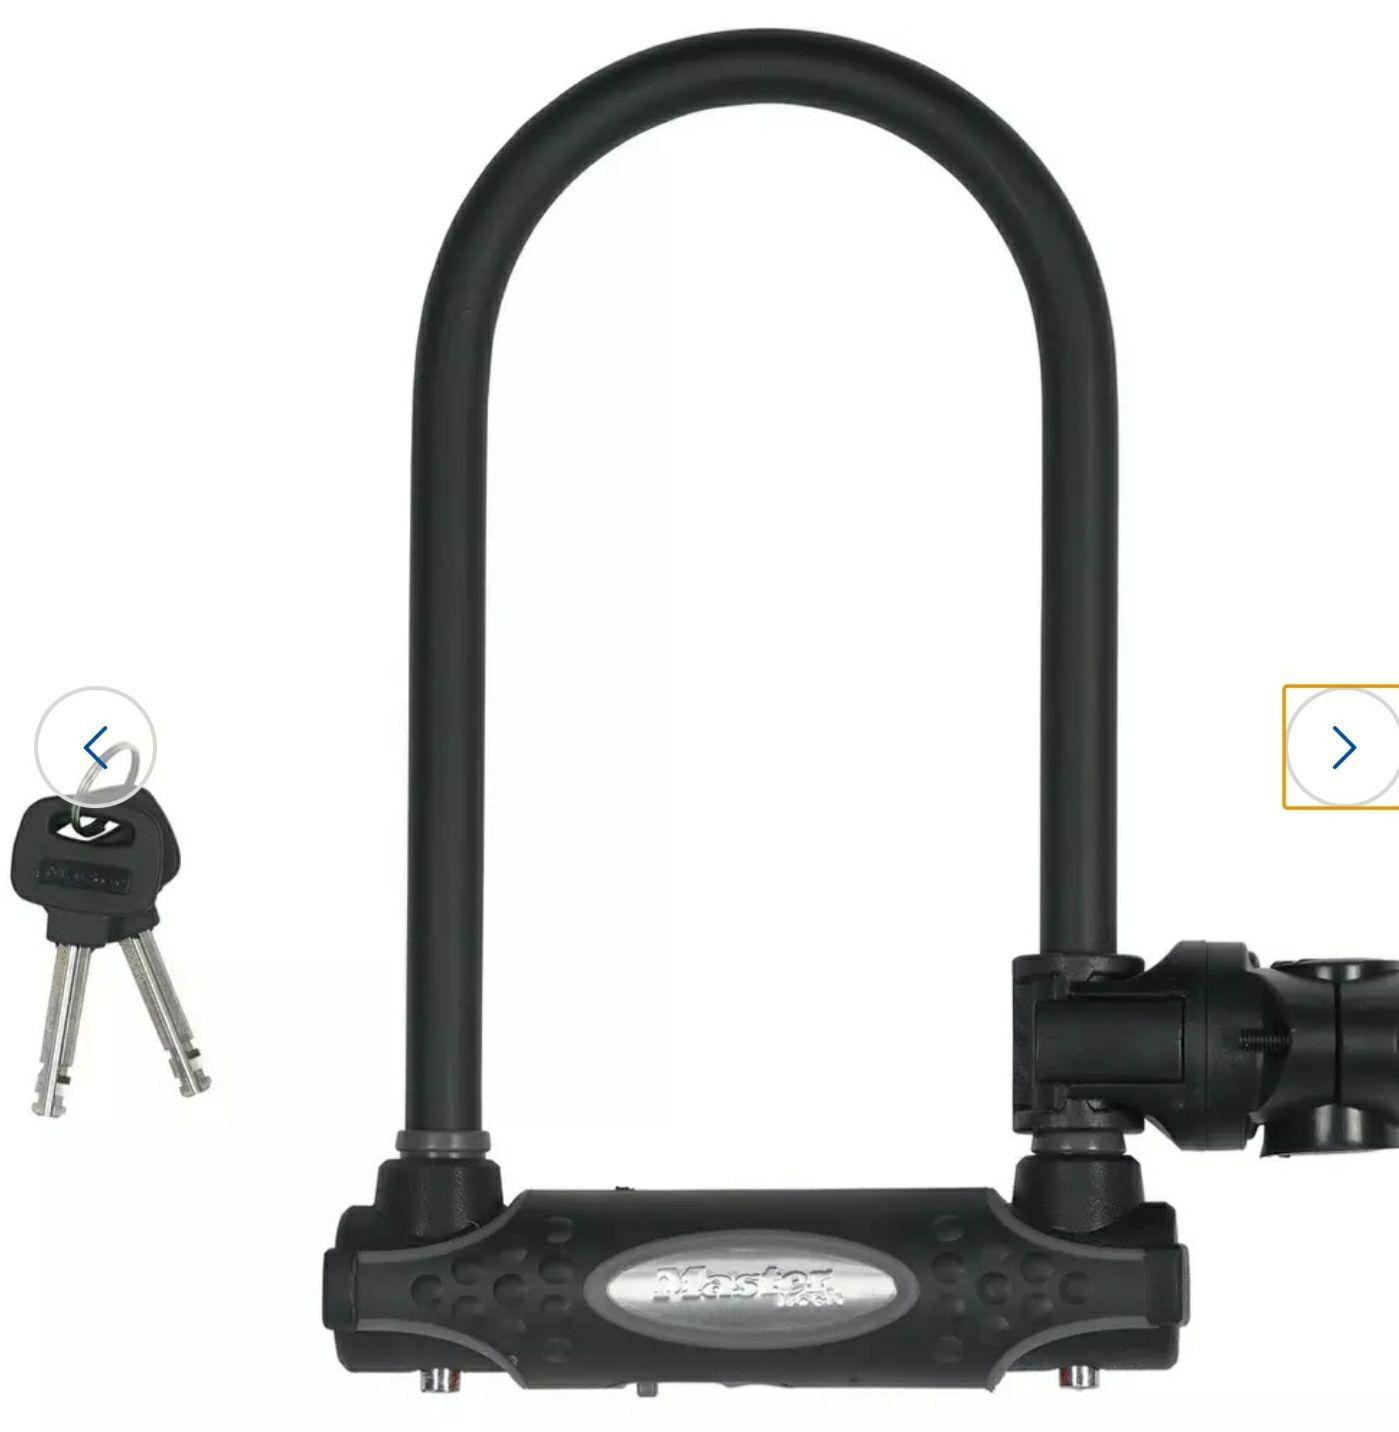 Master Lock Ultra Hardened D Bike Lock - £16.99 @ Argos (Free C&C)